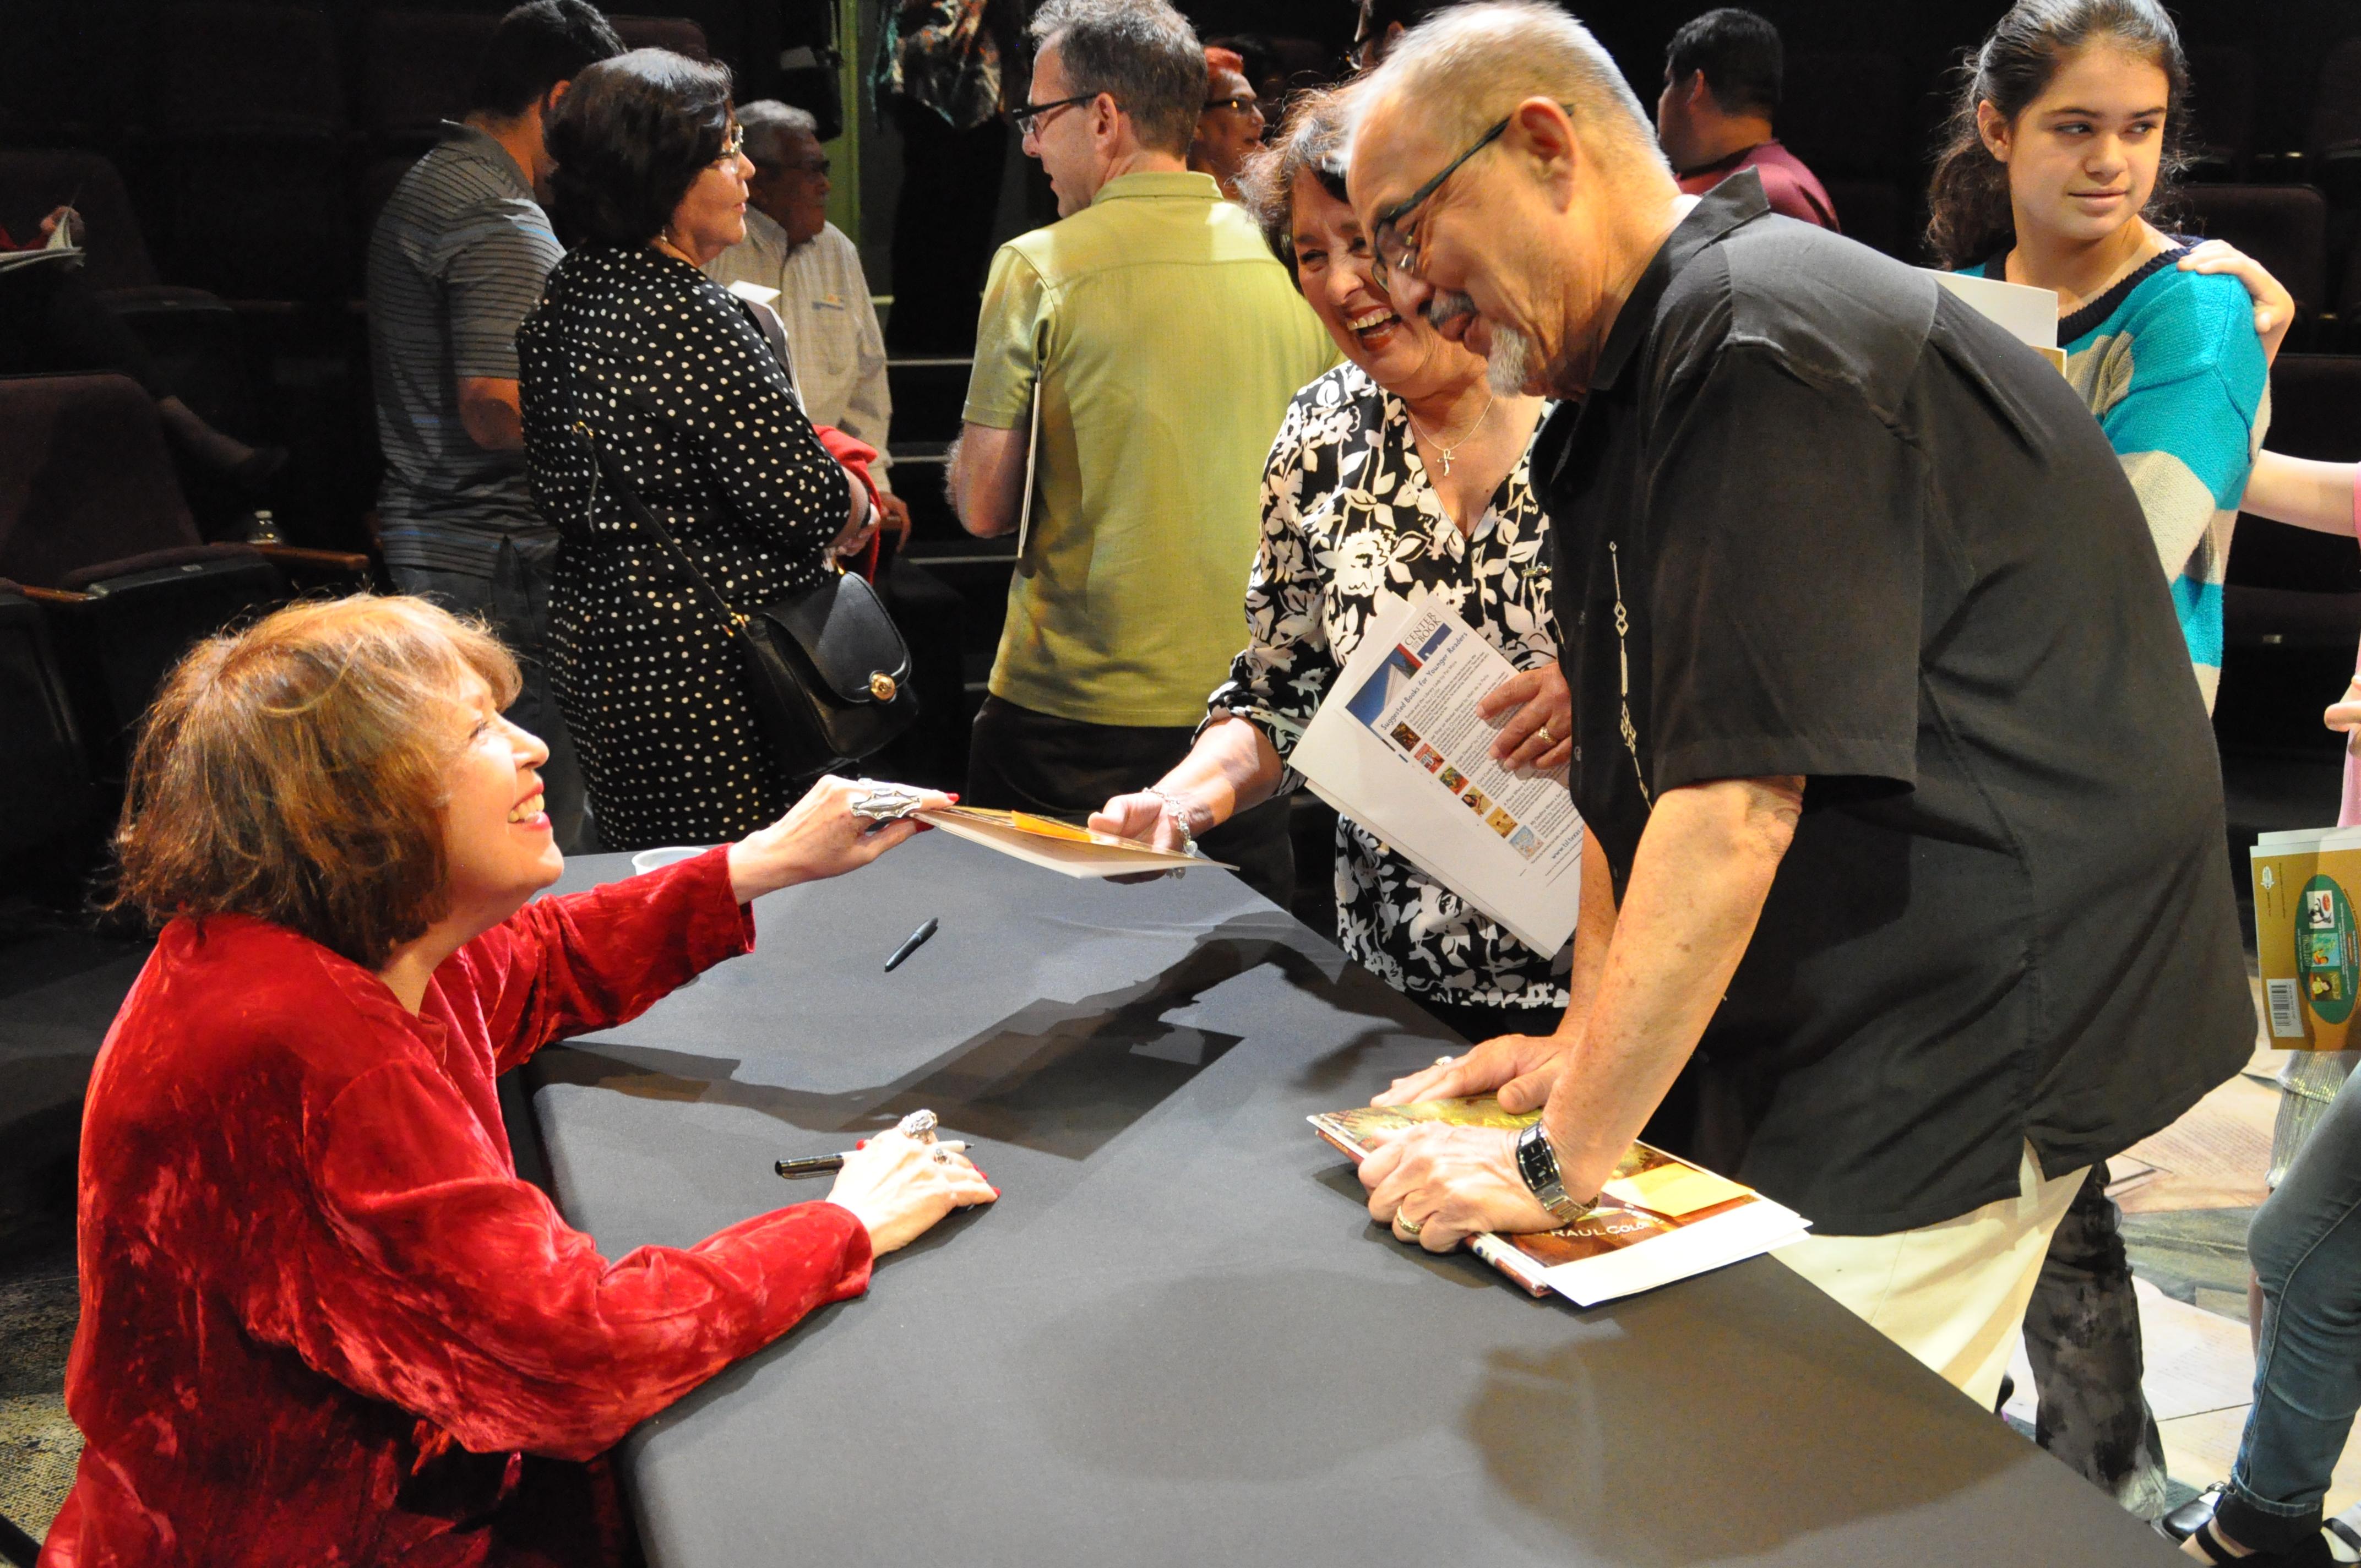 Mora at a book signing in 2015